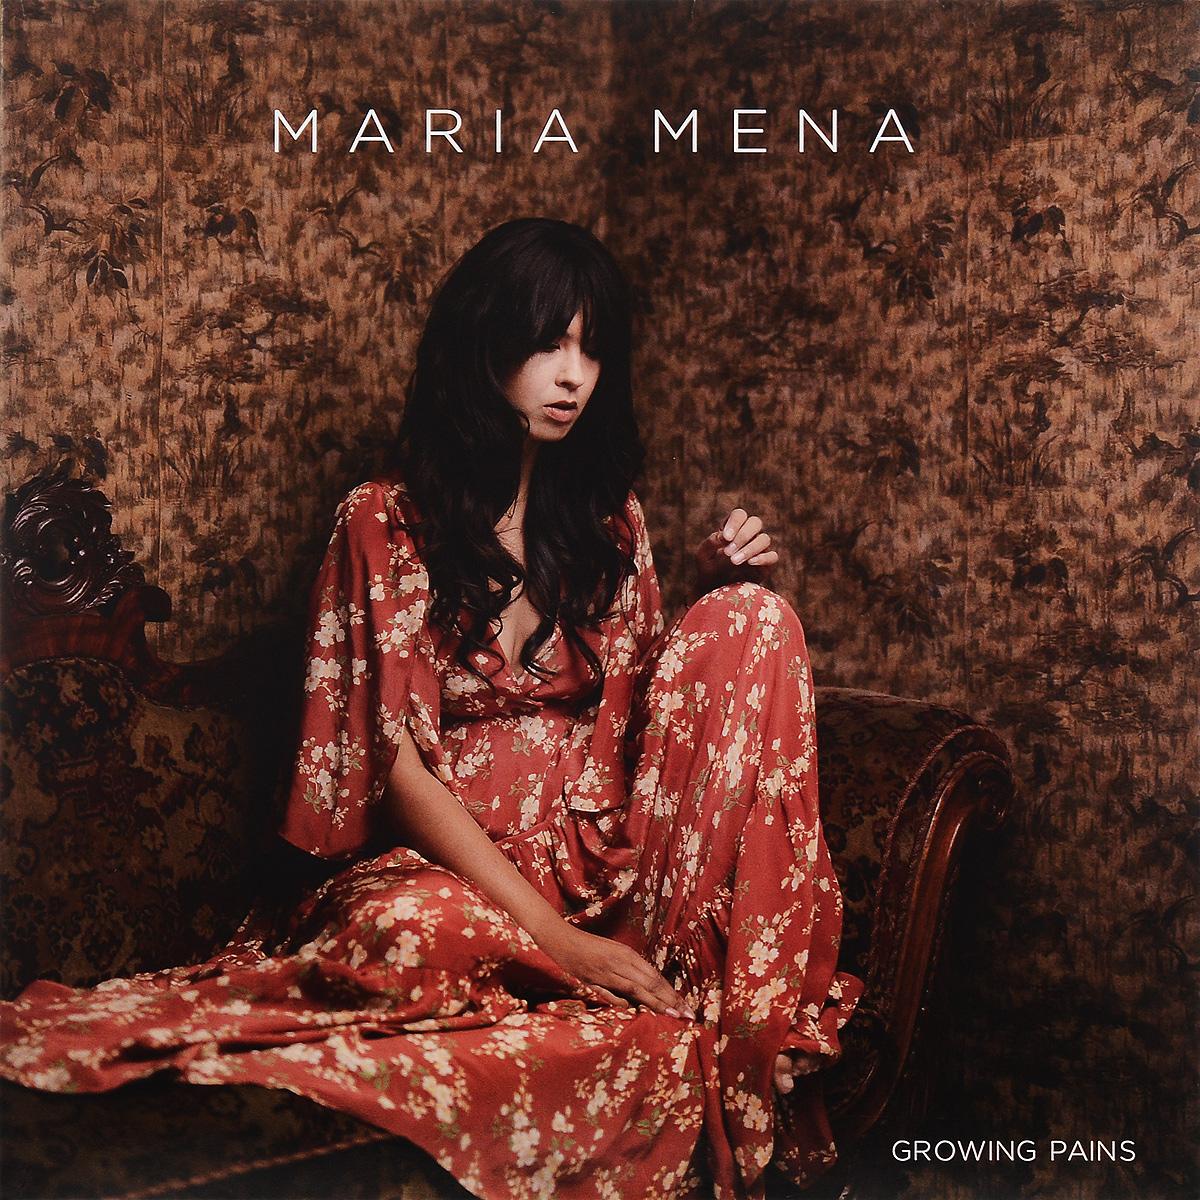 Мария Мена Maria Mena. Growing Pains (LP) eric g flamholtz growing pains